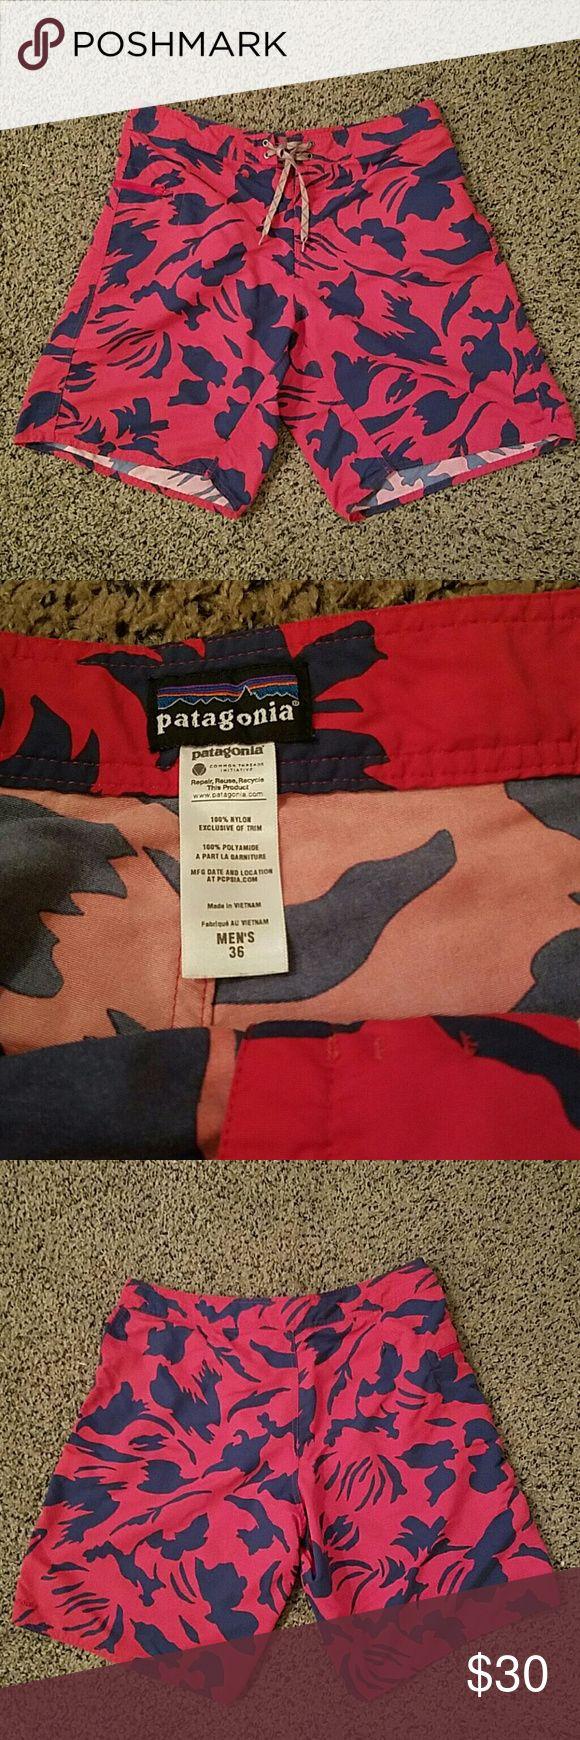 Selling this Men's Patagonia Wafarer board shorts on Poshmark! My username is: jkcontrol. #shopmycloset #poshmark #fashion #shopping #style #forsale #Patagonia #Other